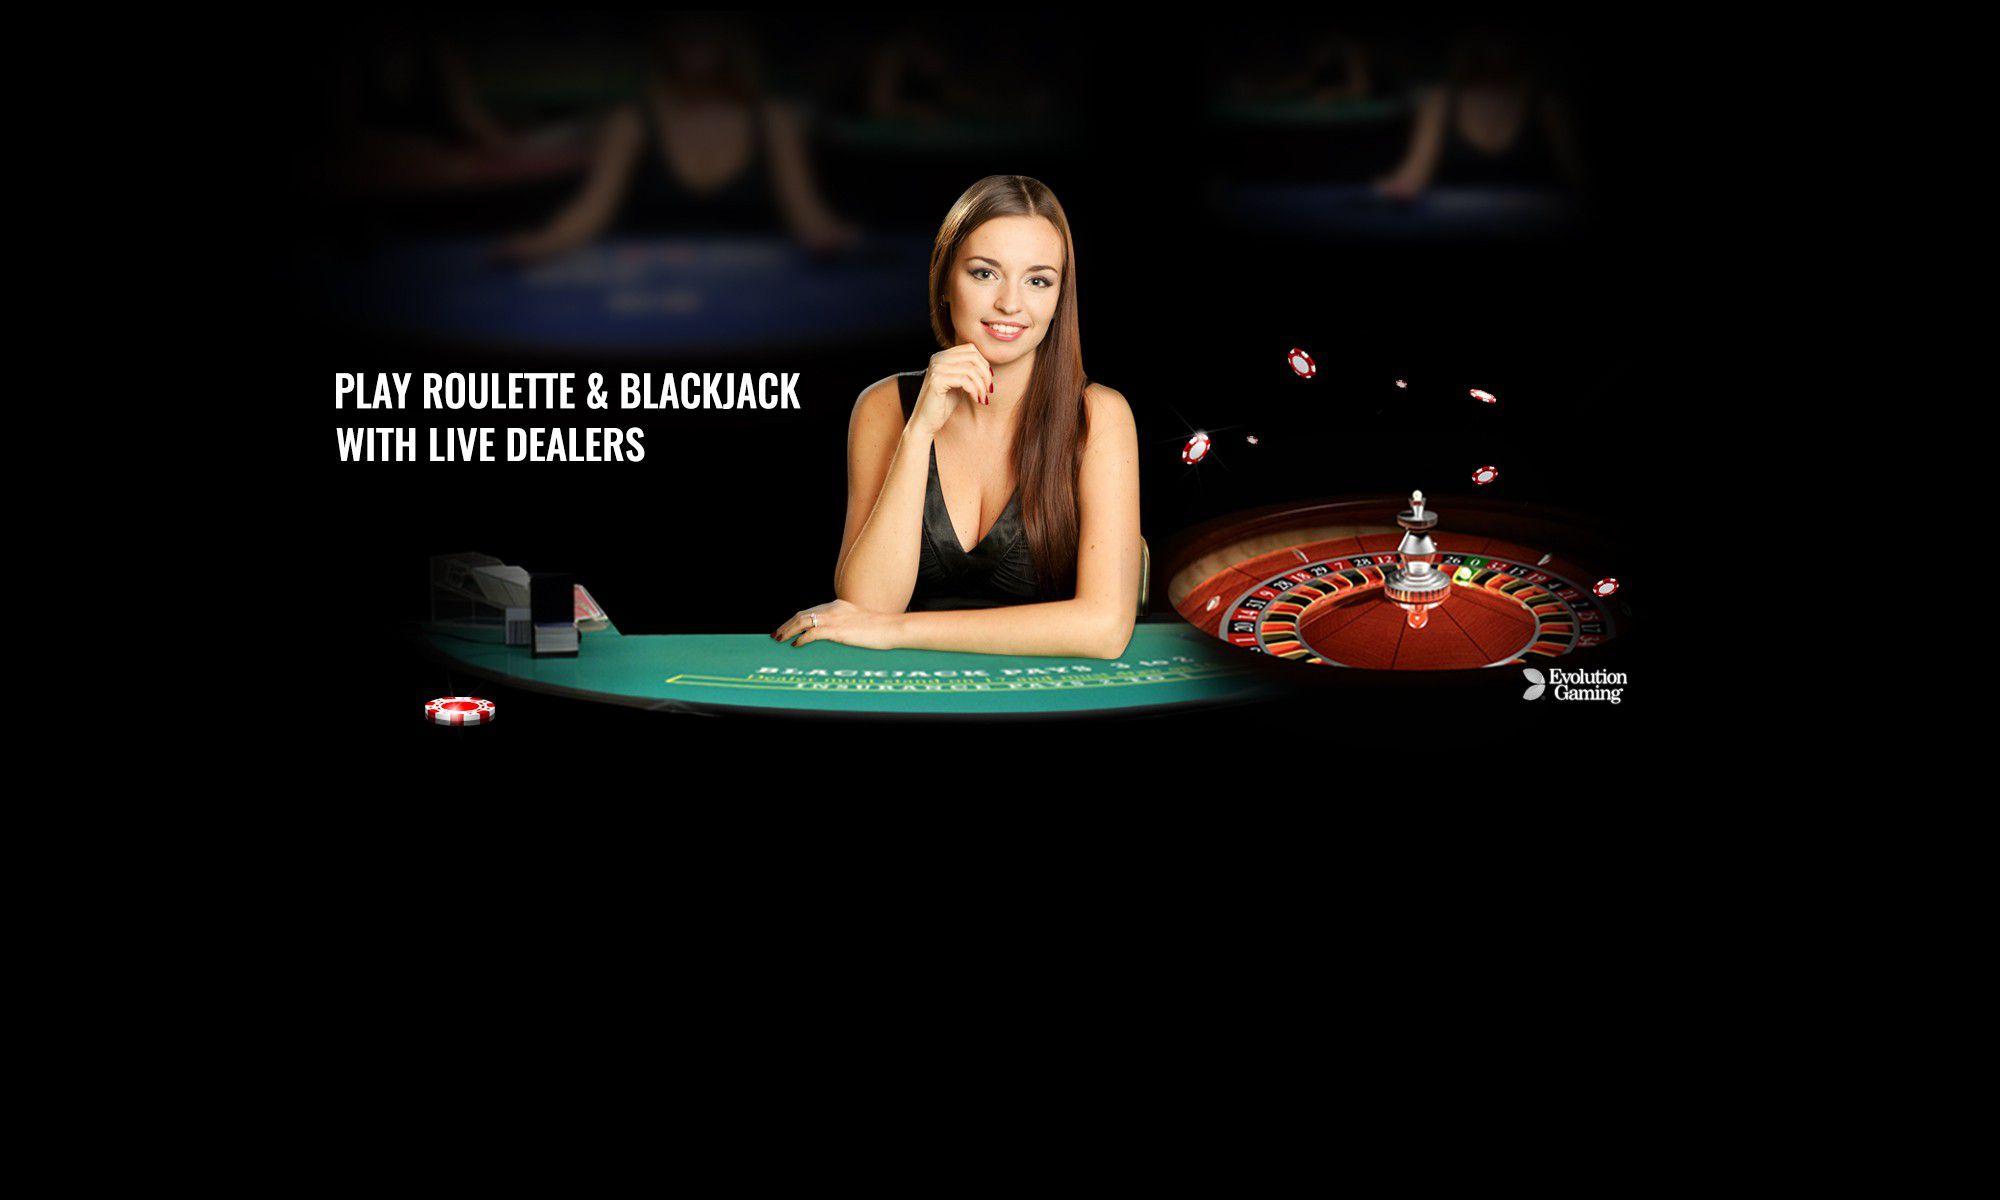 Flash citadel casino blog casino linkdomain online poker.big.gb.com trackback